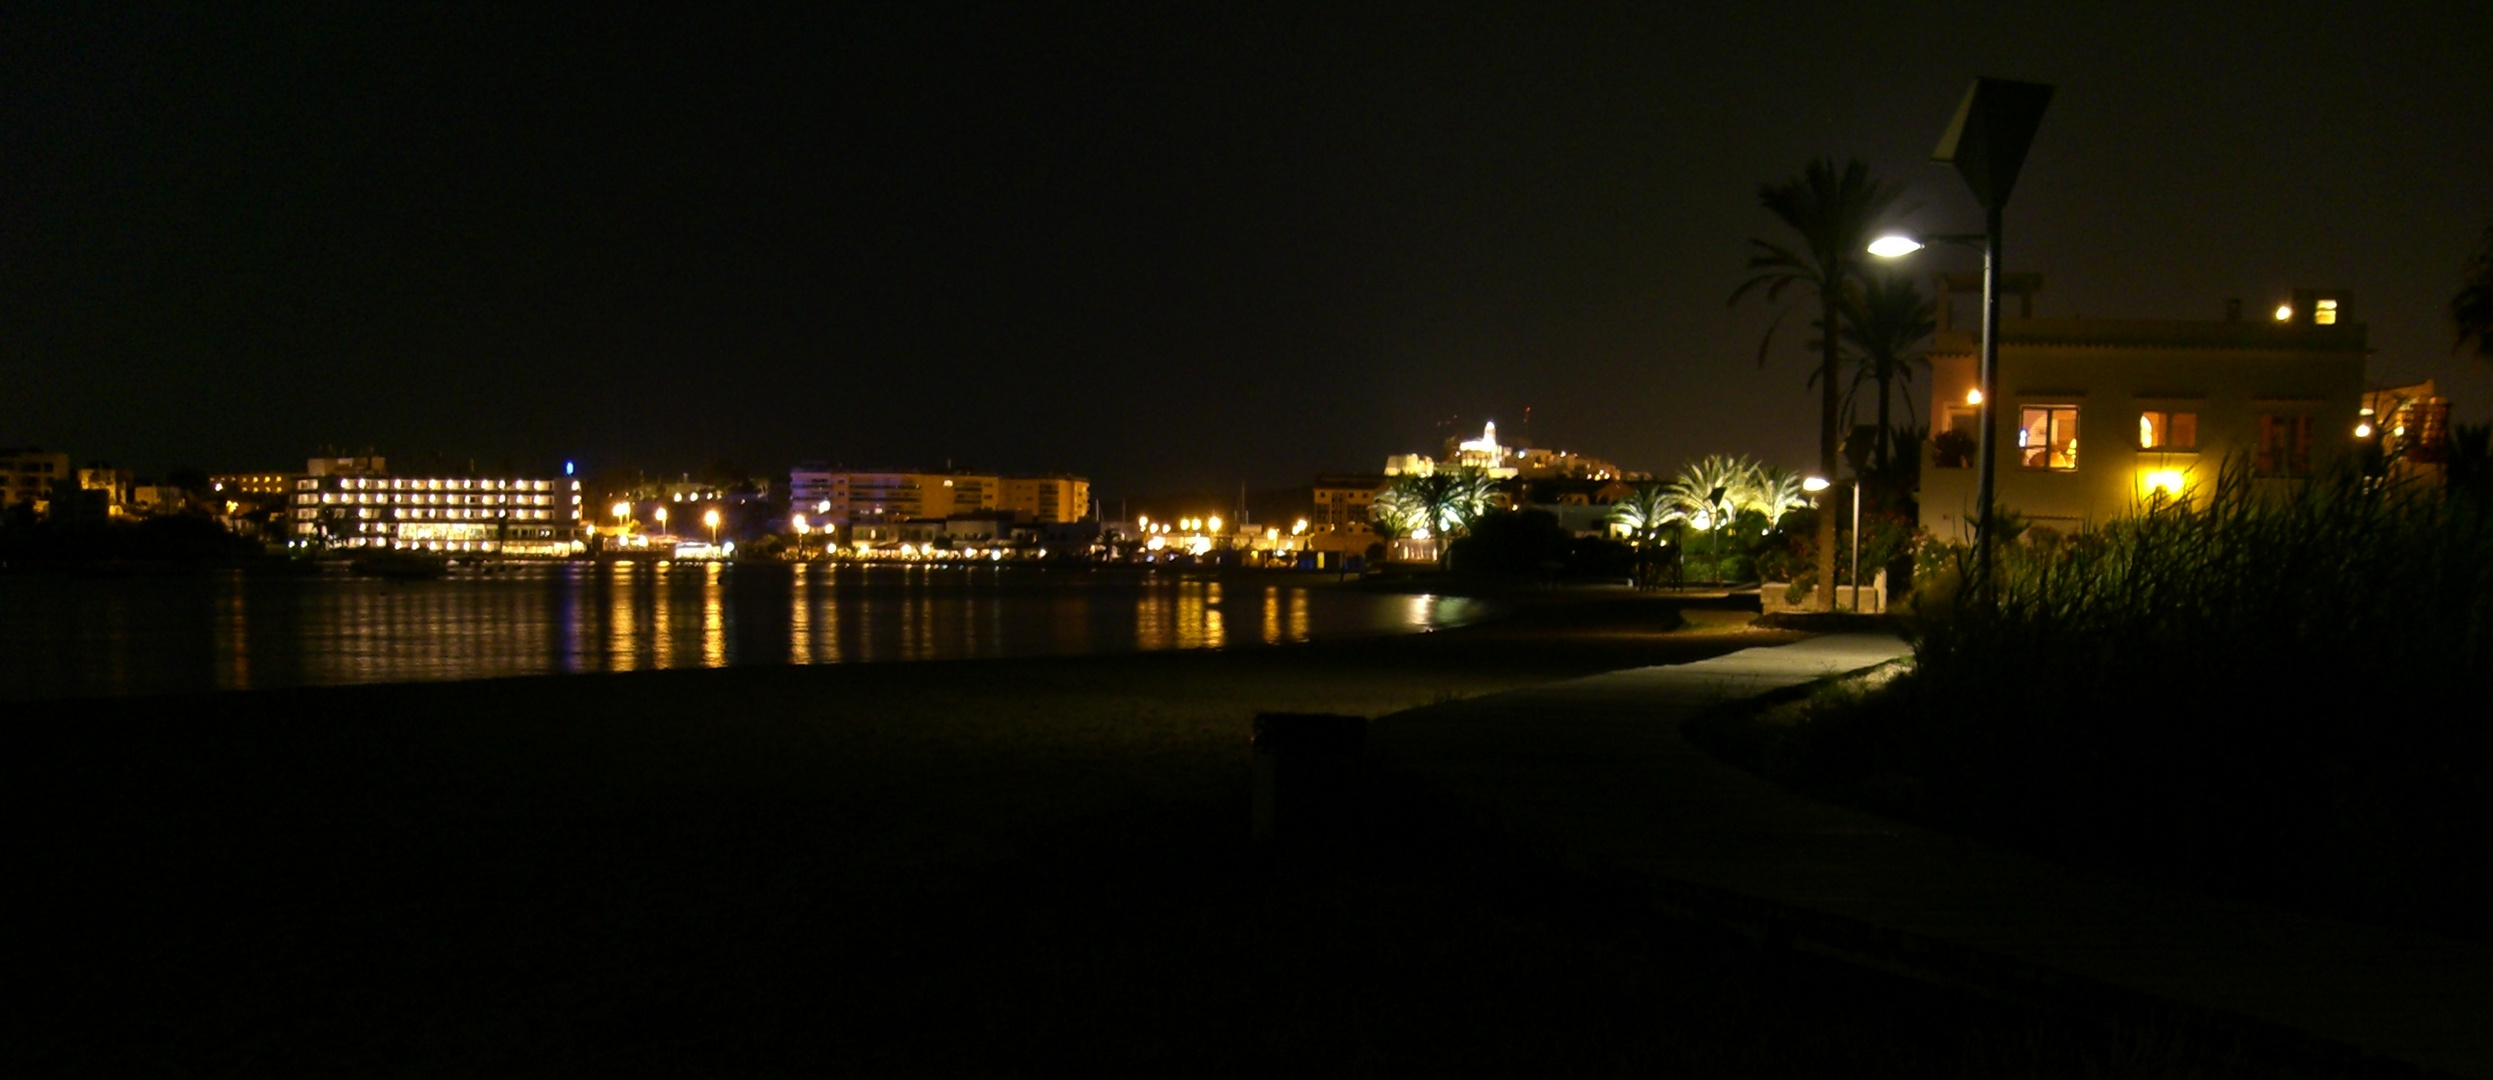 Nightview - Talamanca